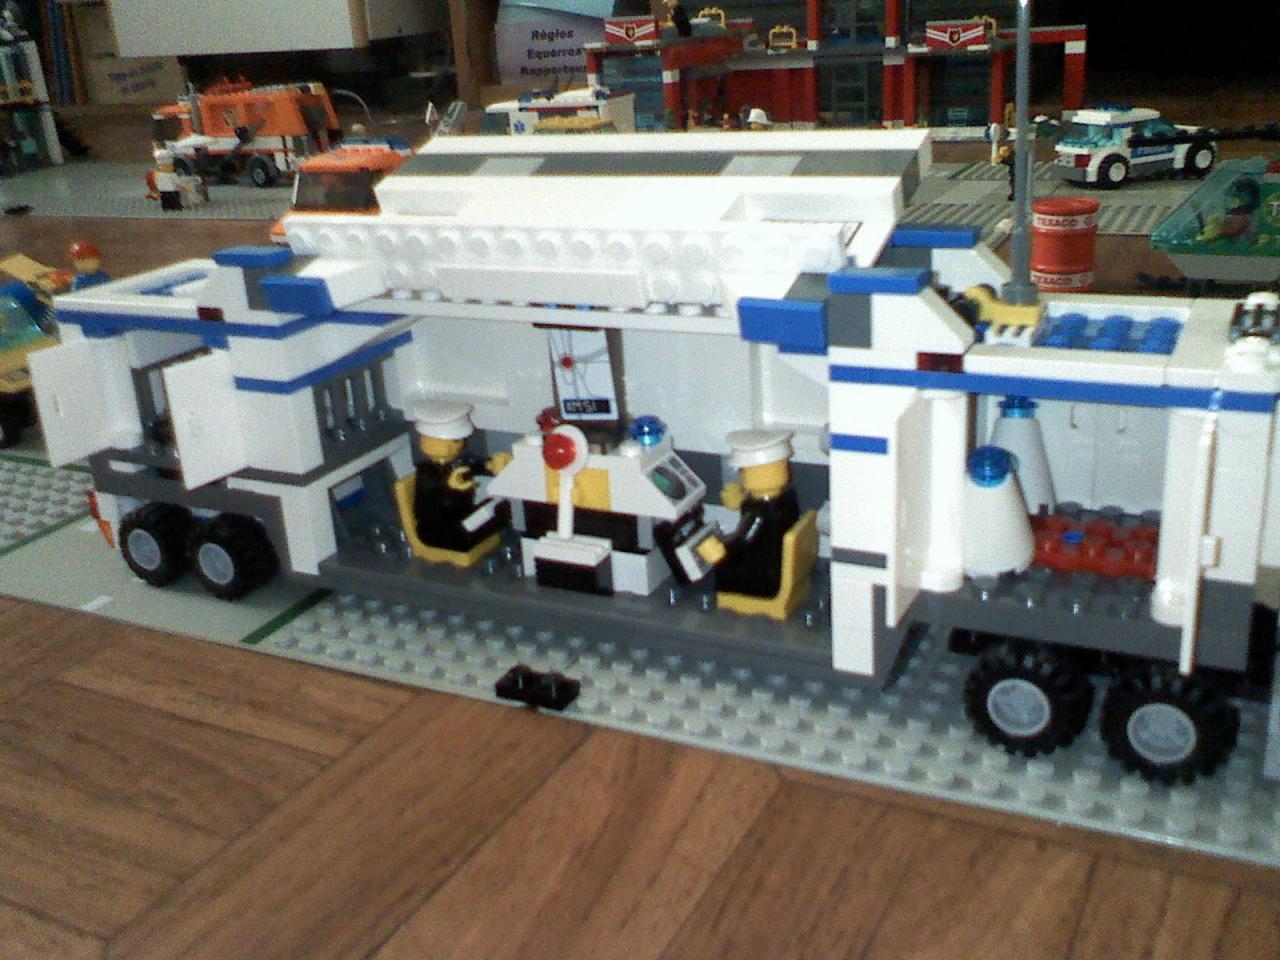 7743 le camion de police for Laporte city police